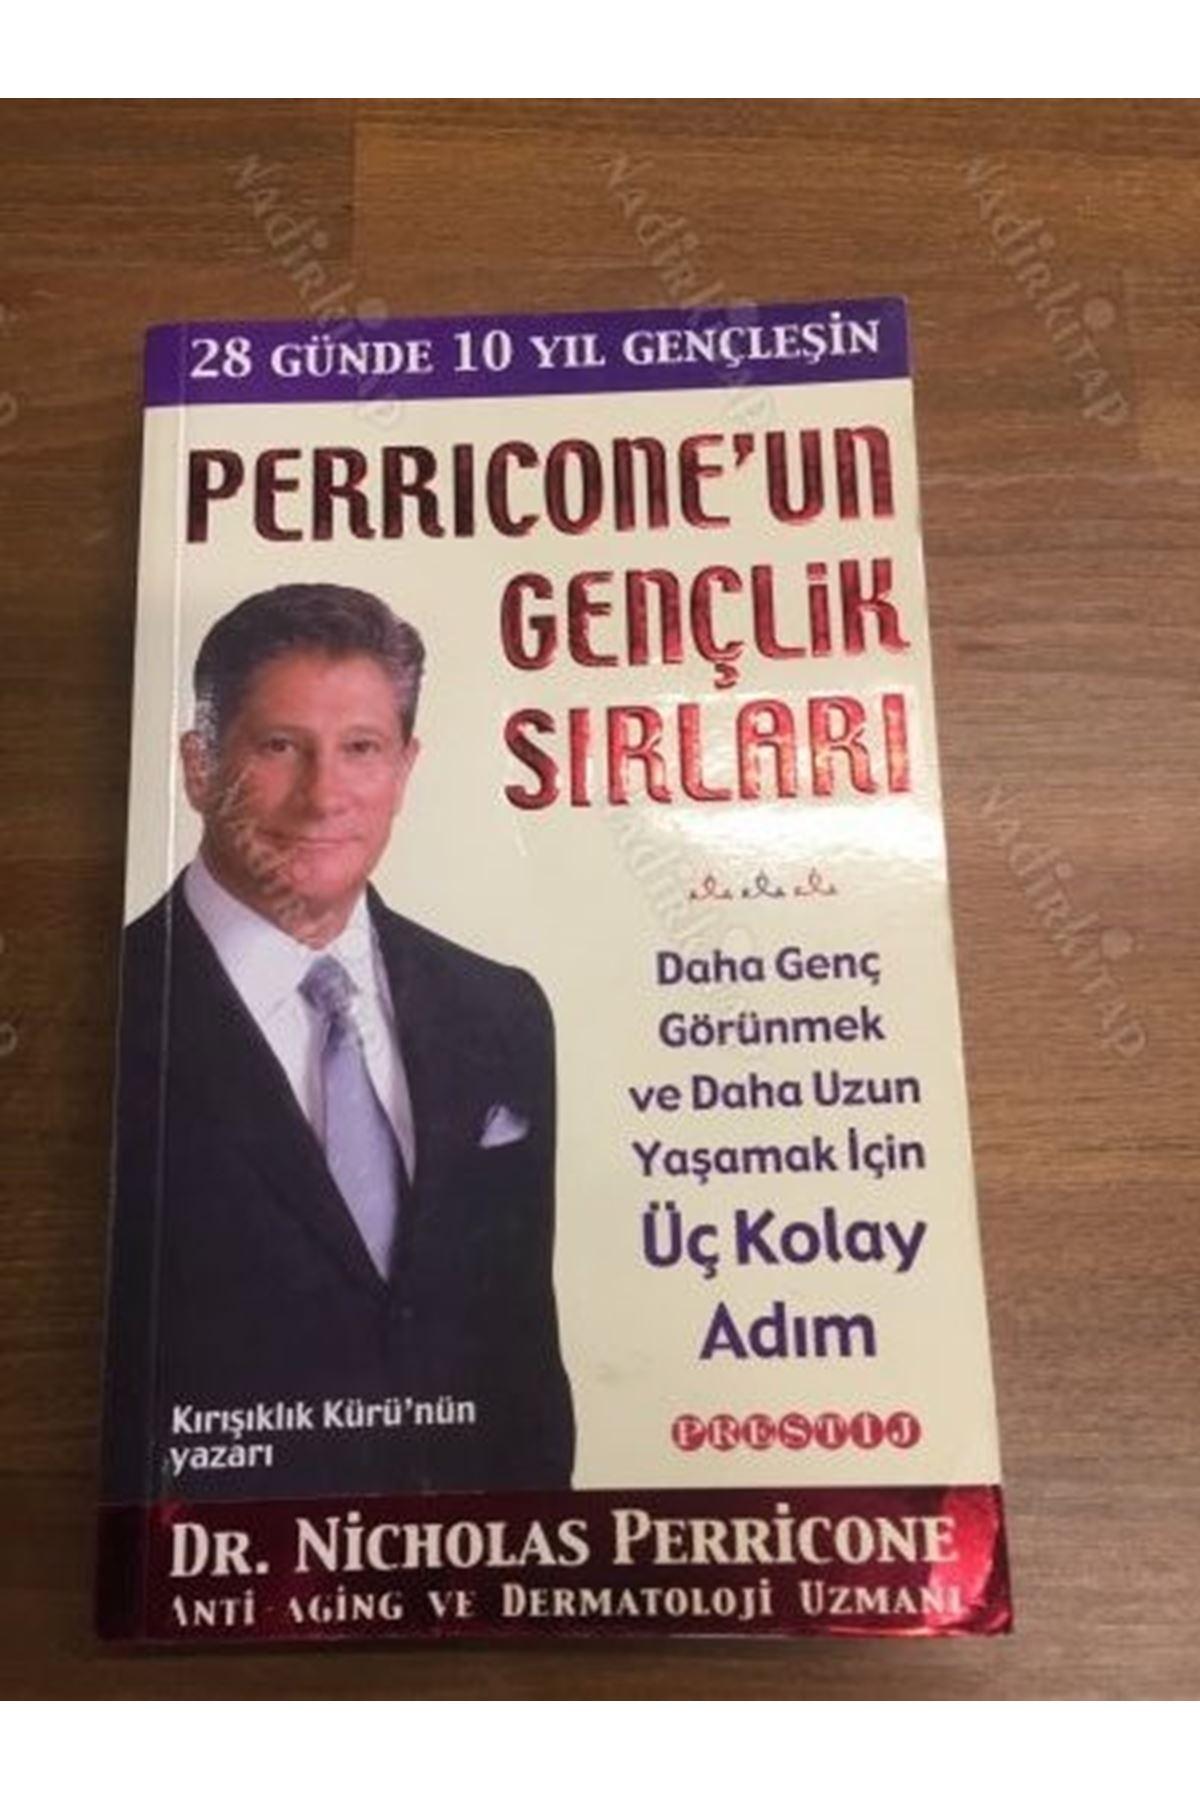 NICHOLAS PERRICONE - PERRICONE'UN GEÇNLİK SIRLARI